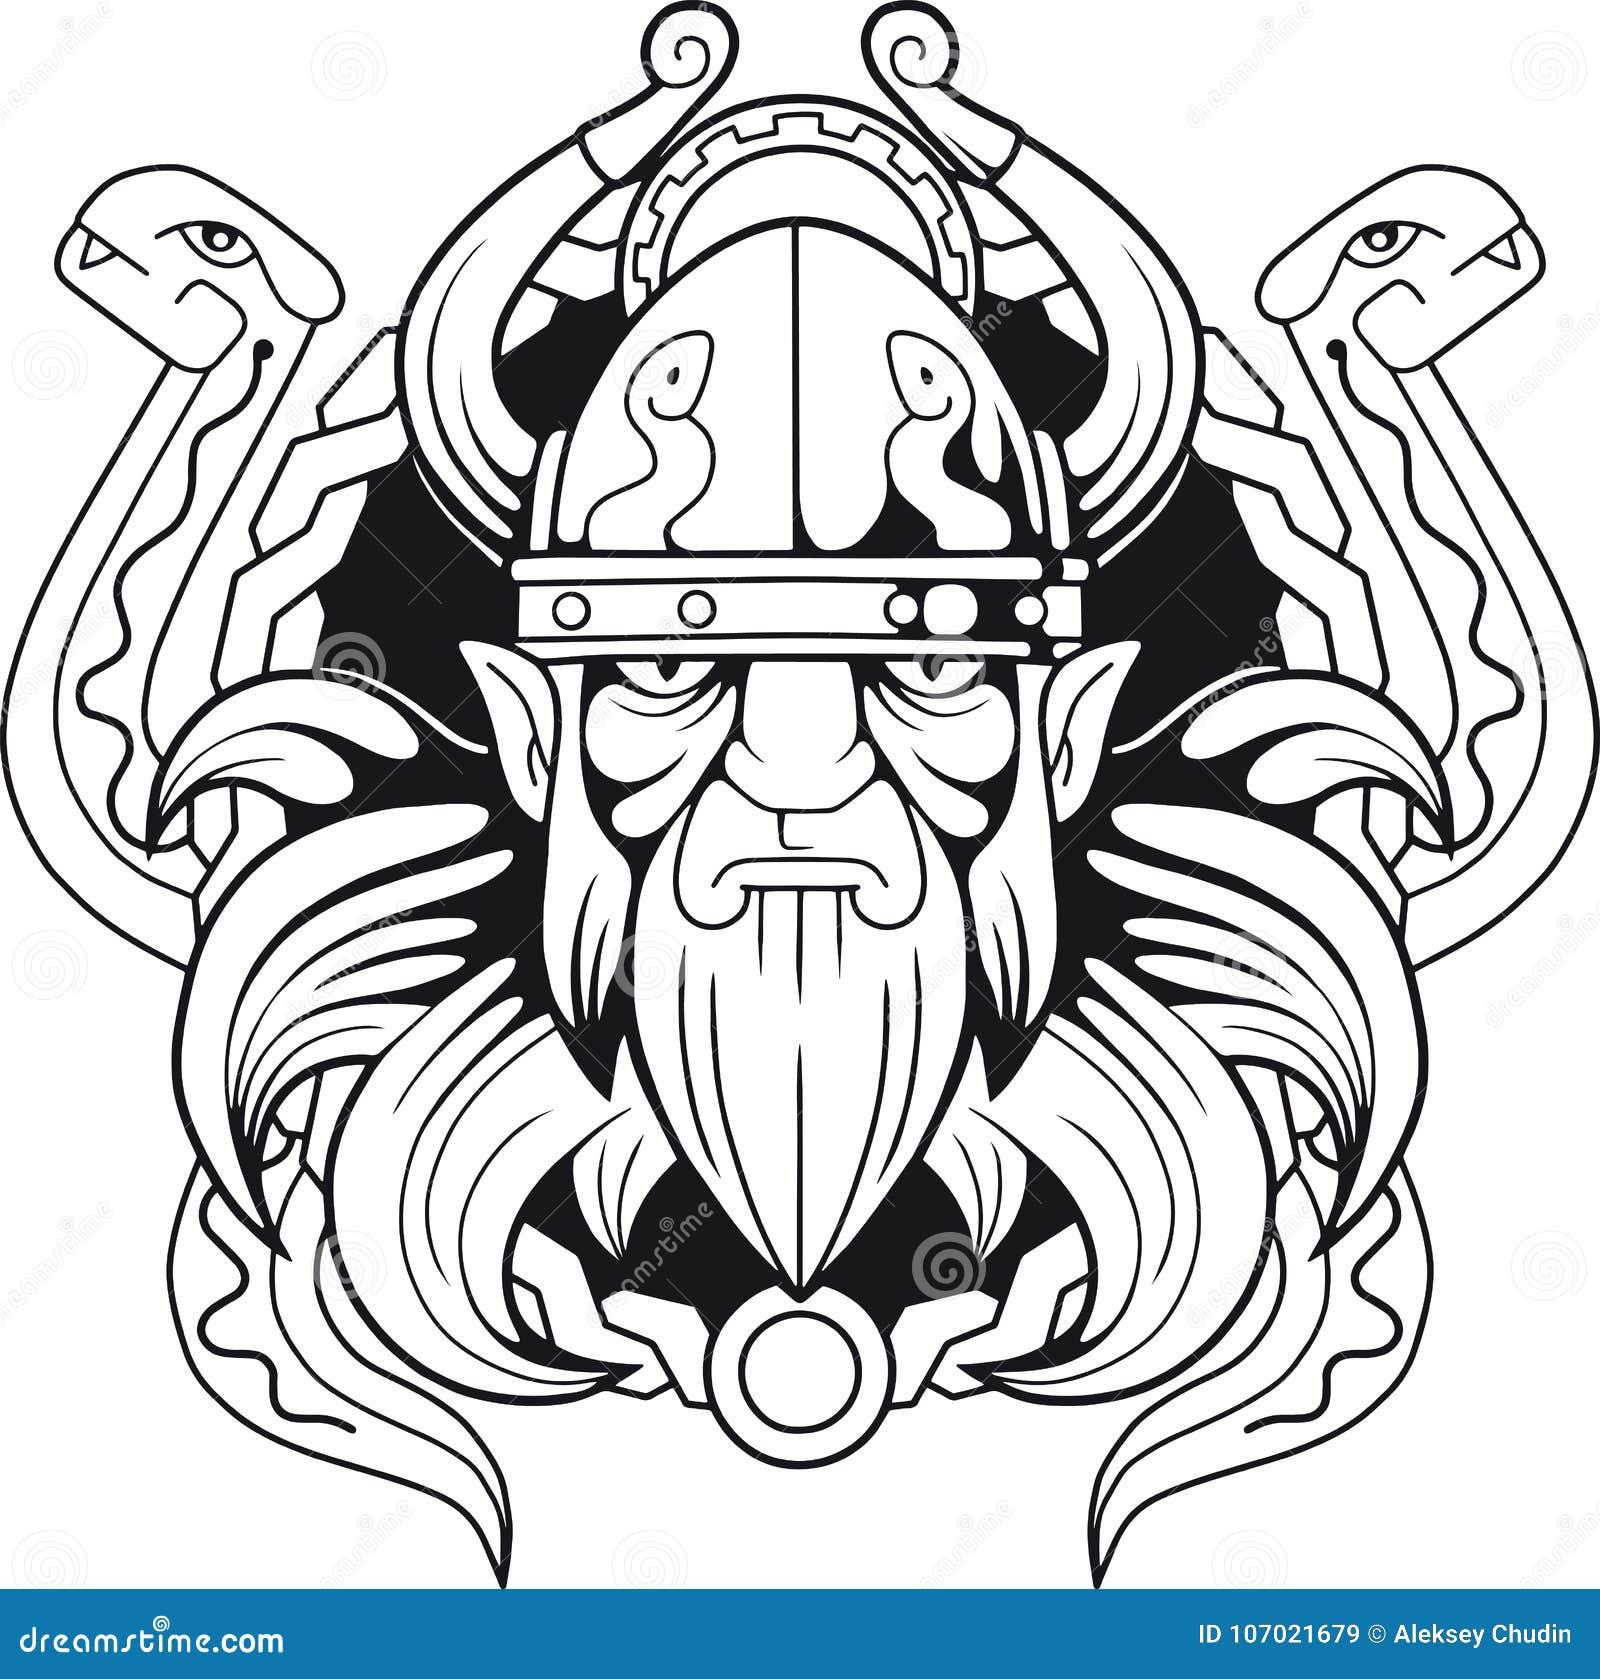 Scandinavian God Of Deception Loki Stock Vector Illustration Of